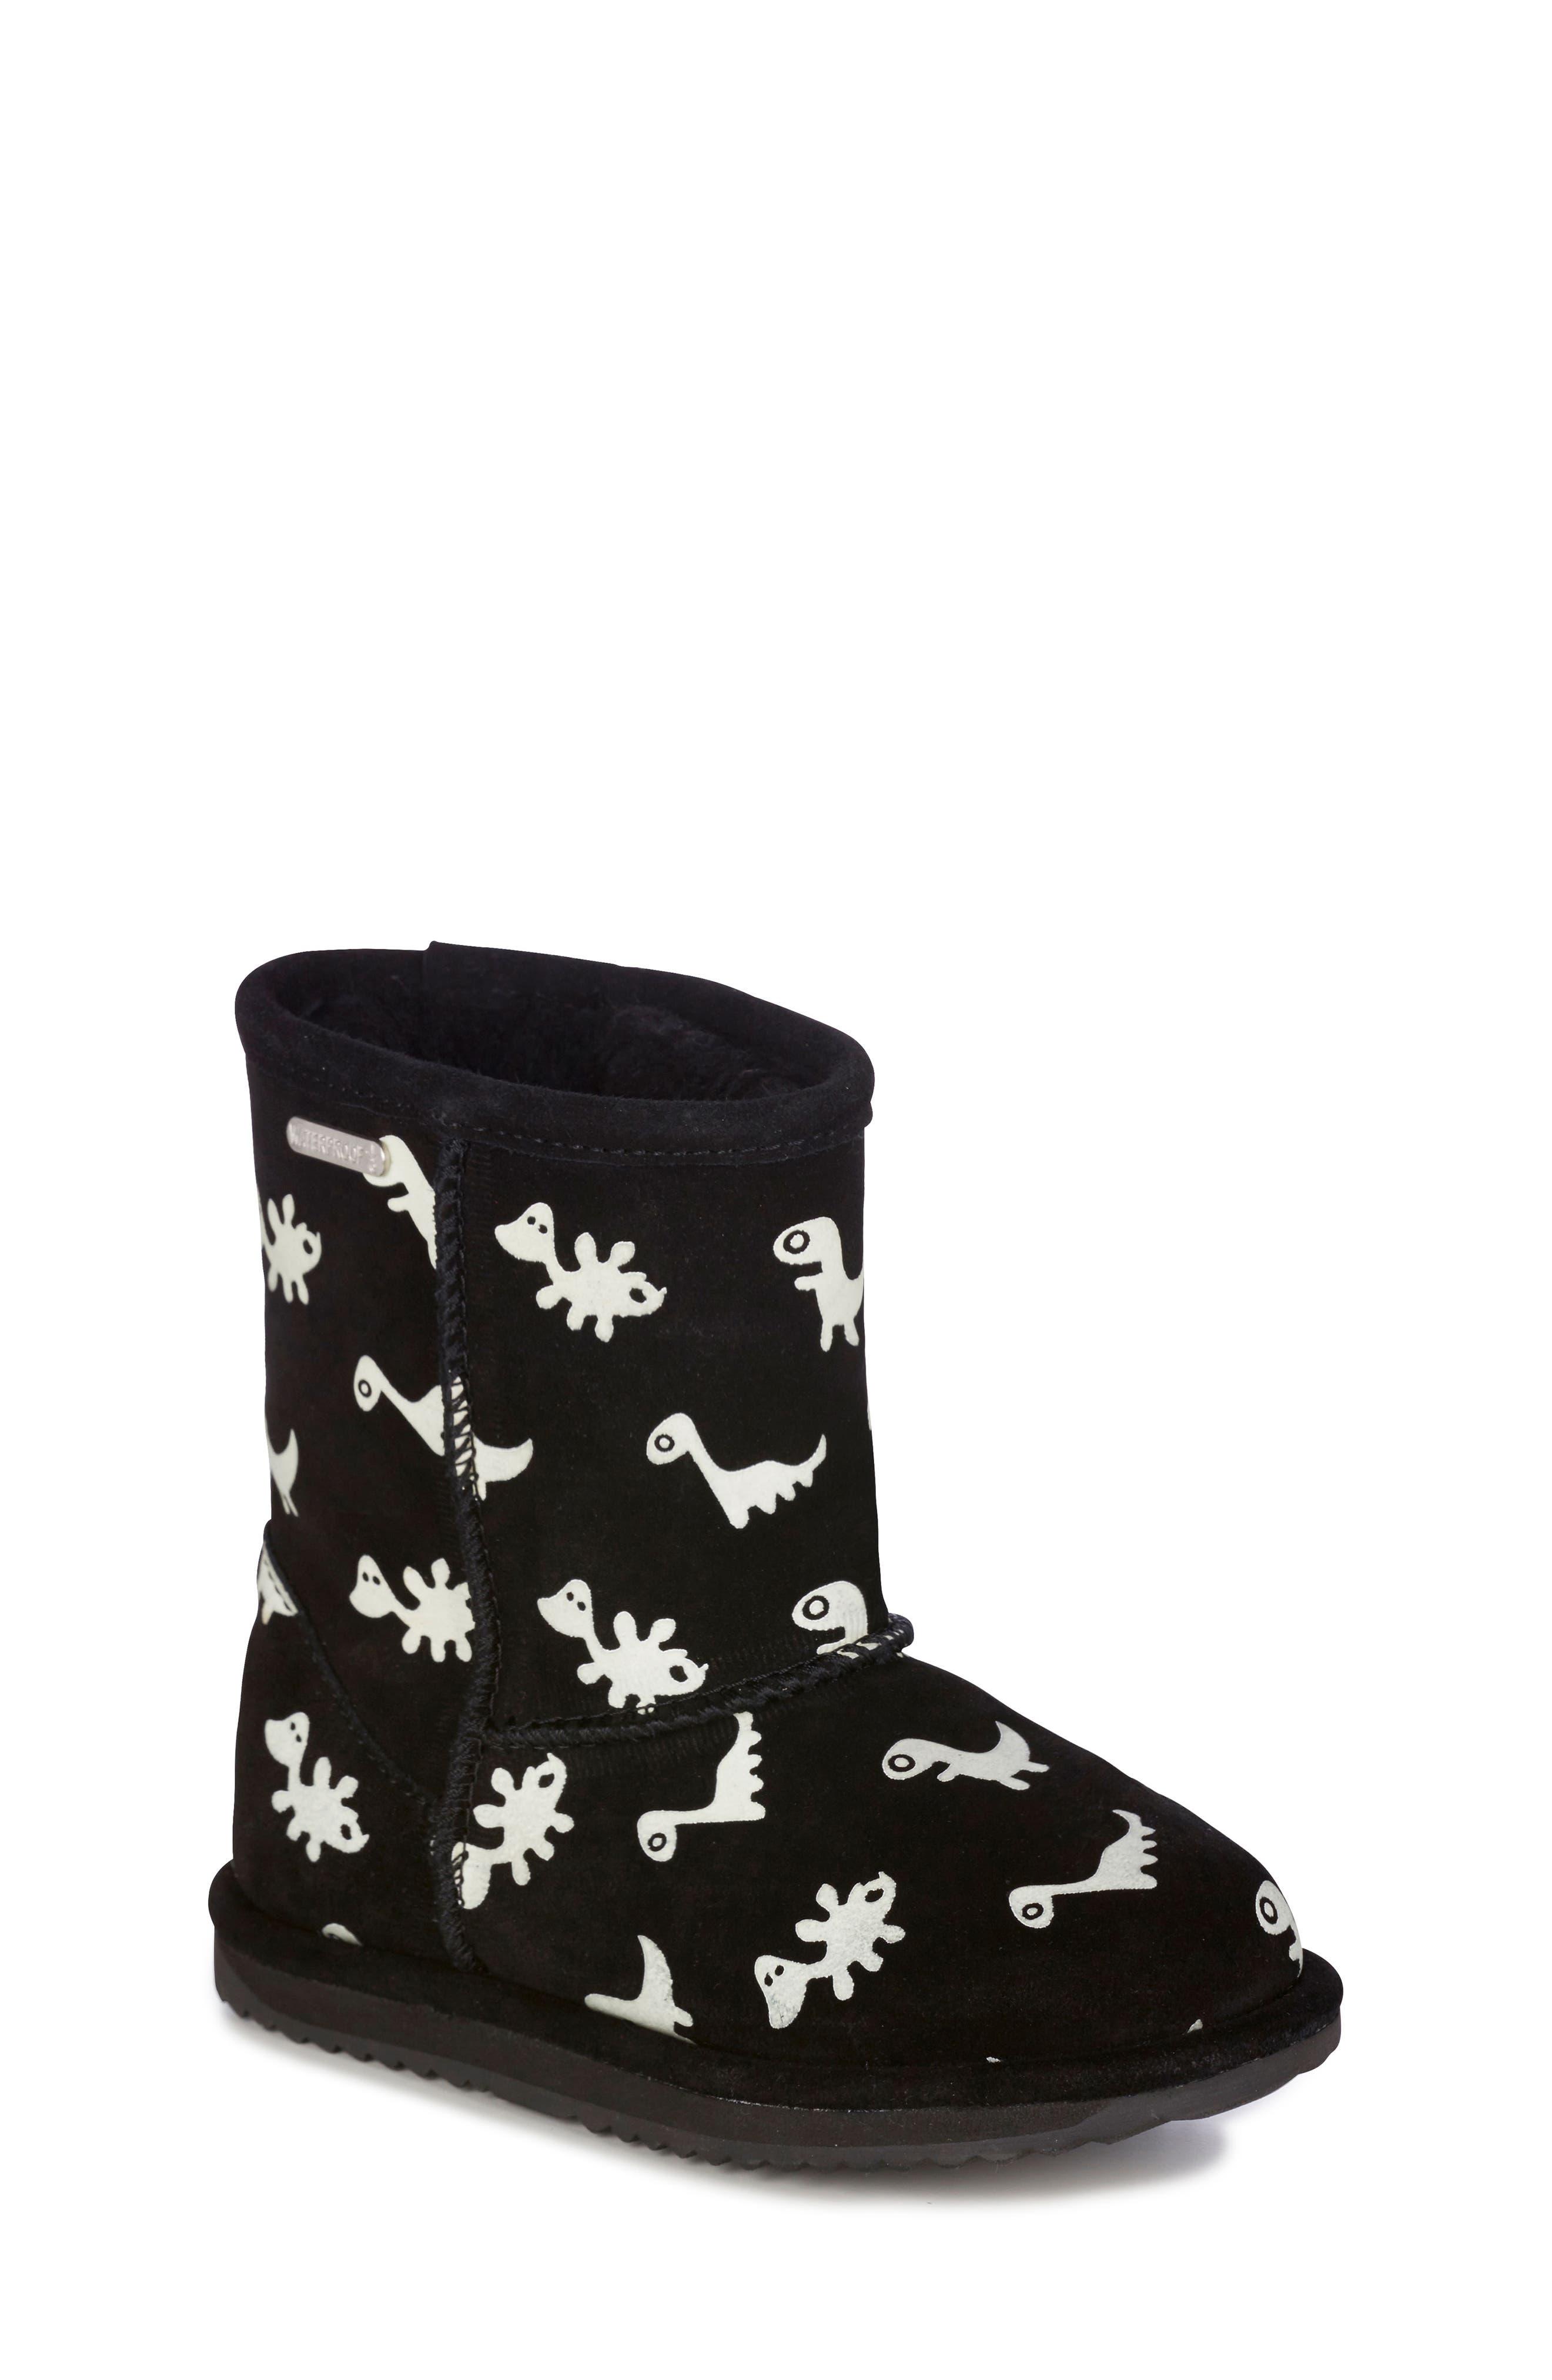 Animal Print Boots,                         Main,                         color, BLACK